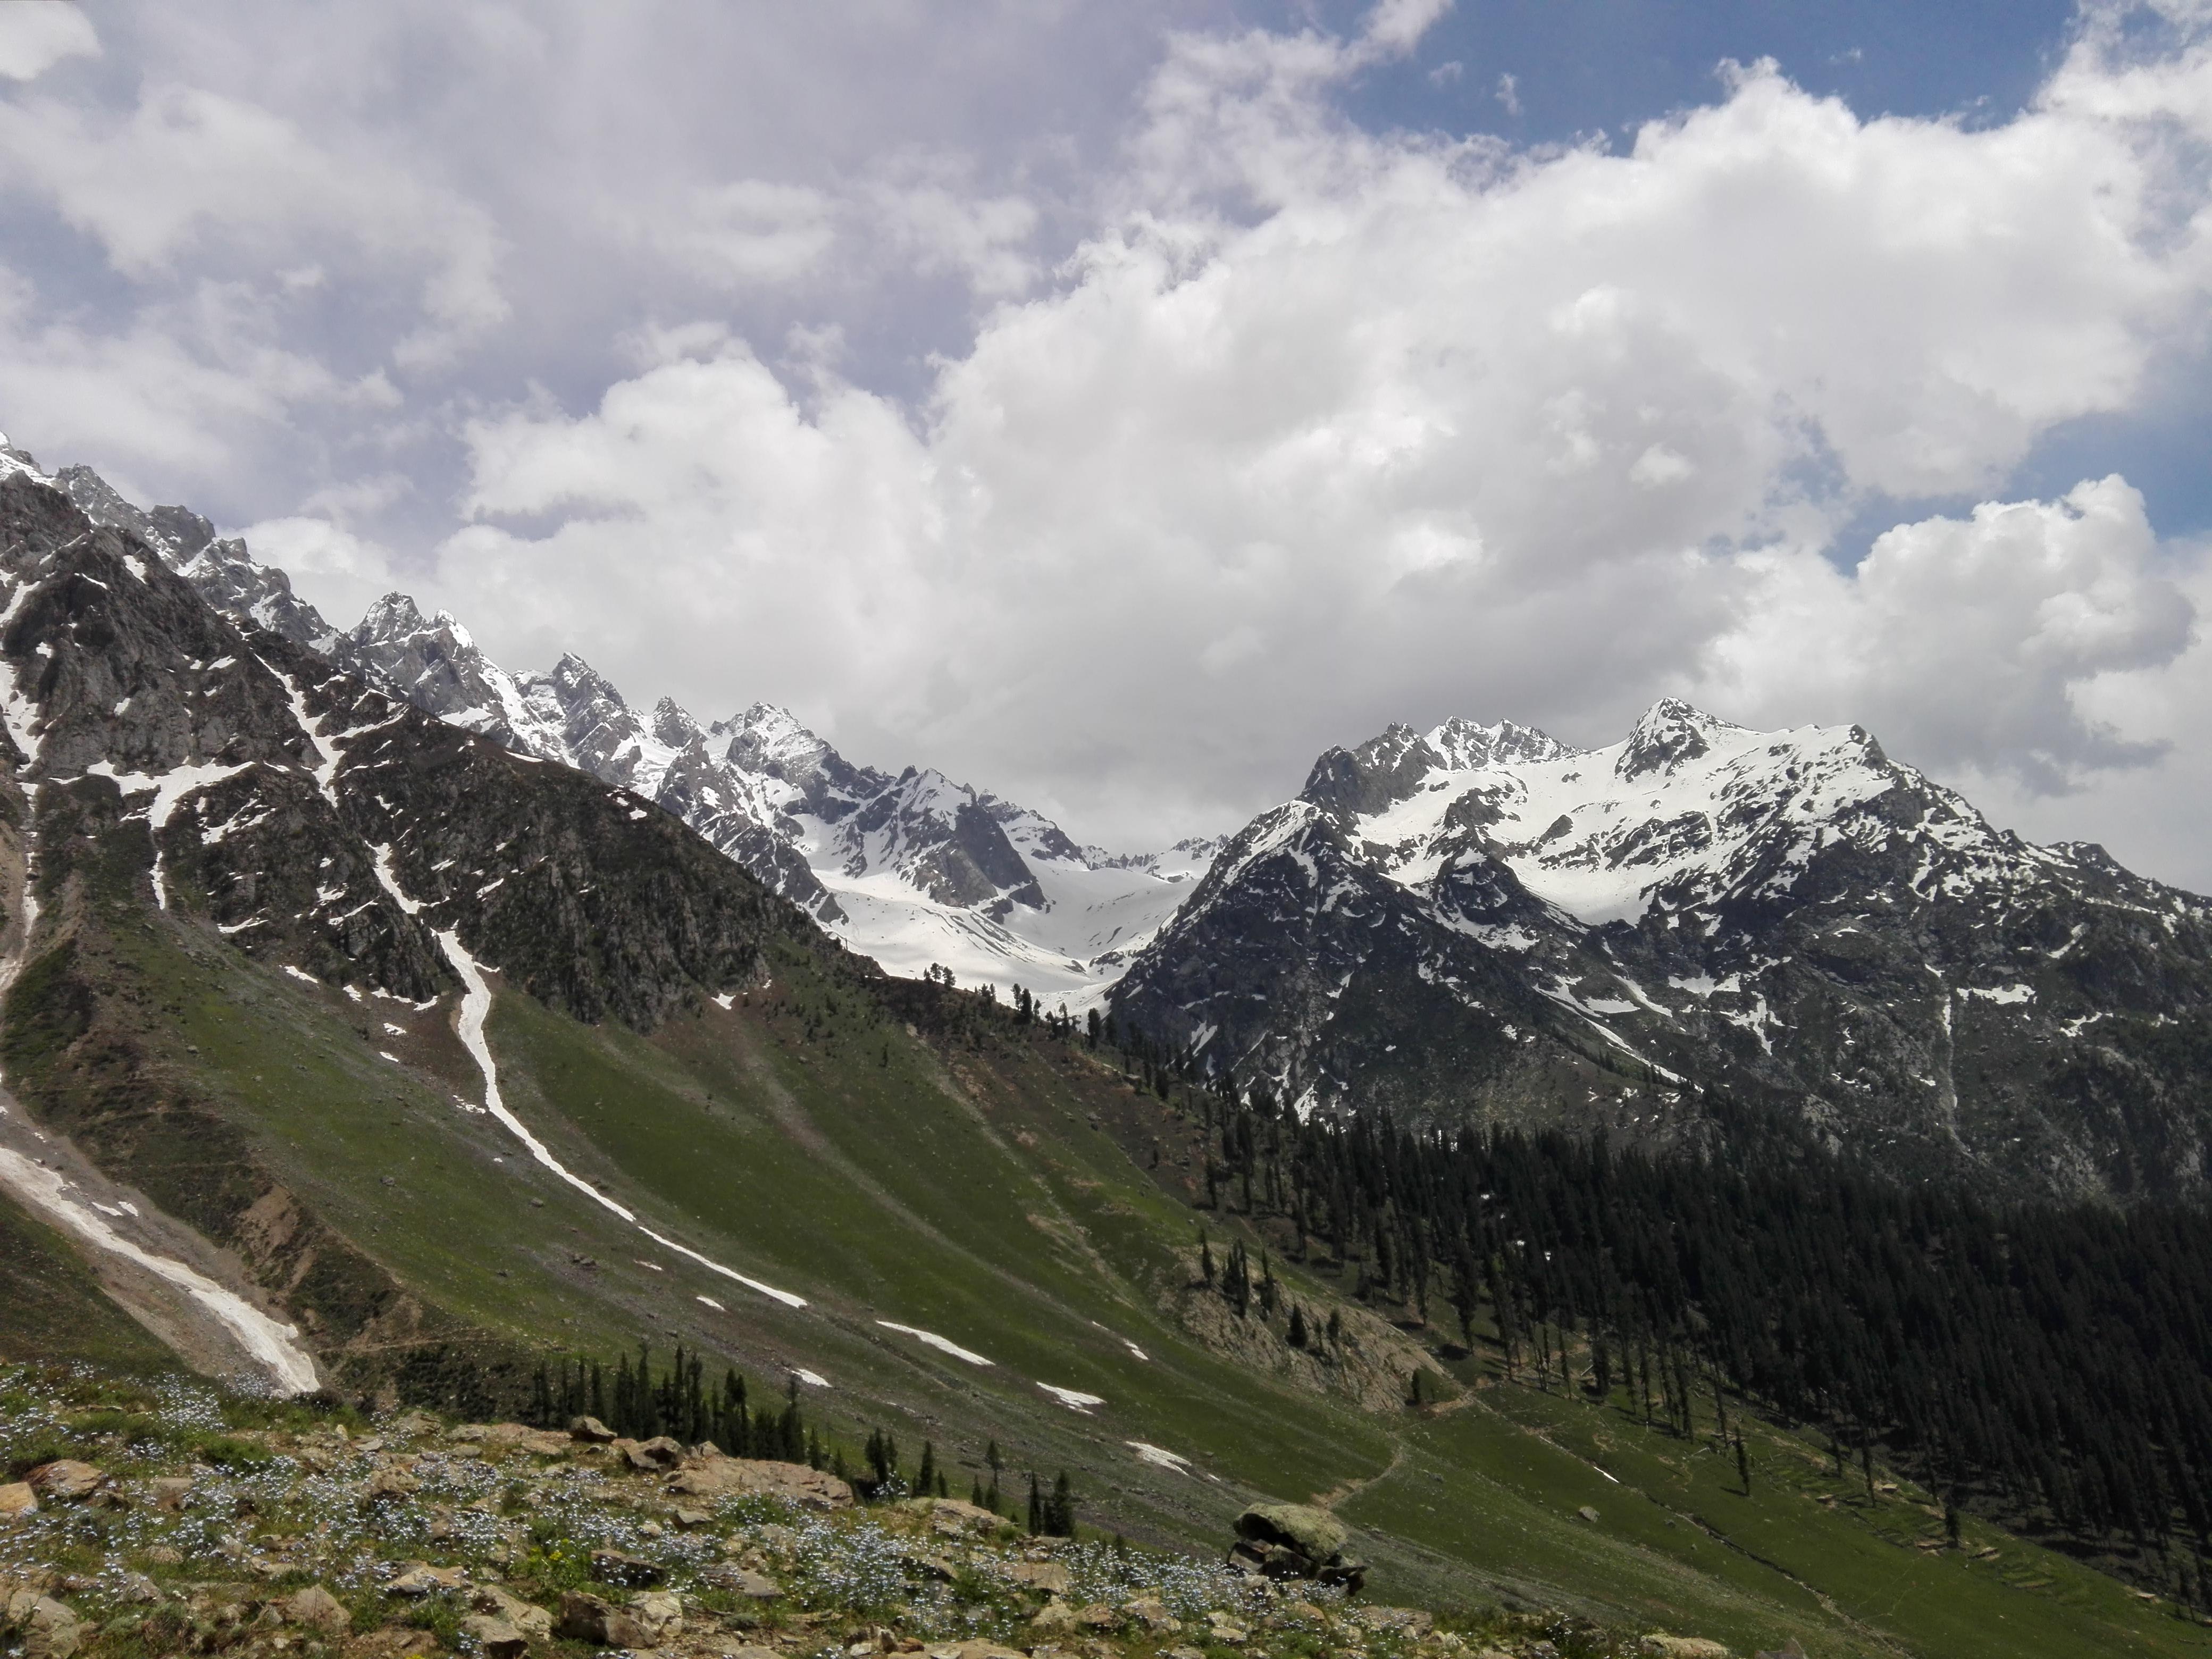 File:Ushu Glaciers, Swat Valley Pakistan.jpg